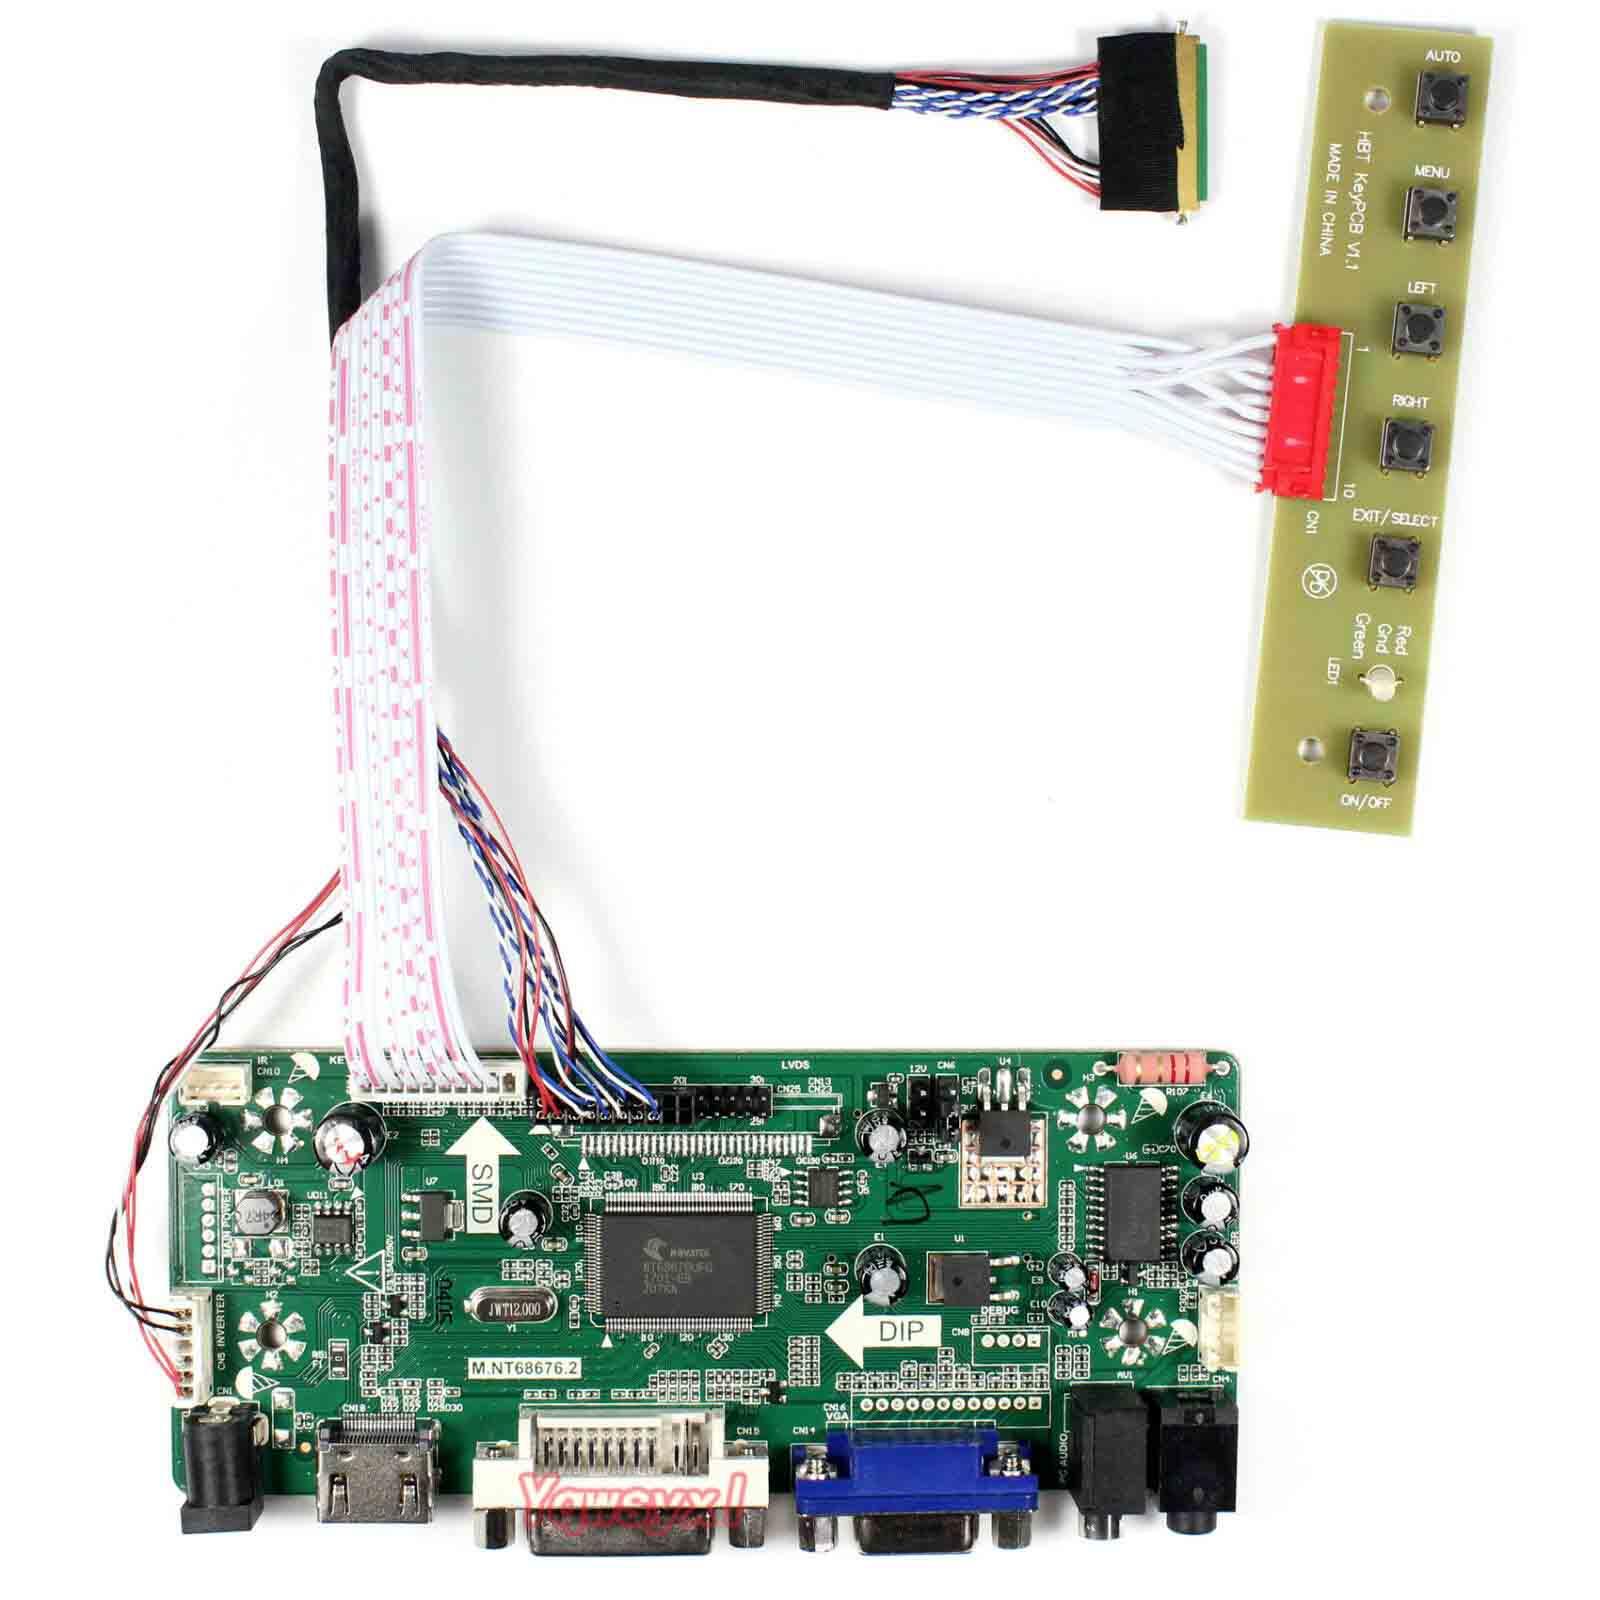 Yqwsyxl Control Board Monitor Kit For LP101WSA(TL)(N1)  LP101WSA-TLN1 HDMI+DVI+VGA LCD LED Screen Controller Board Driver